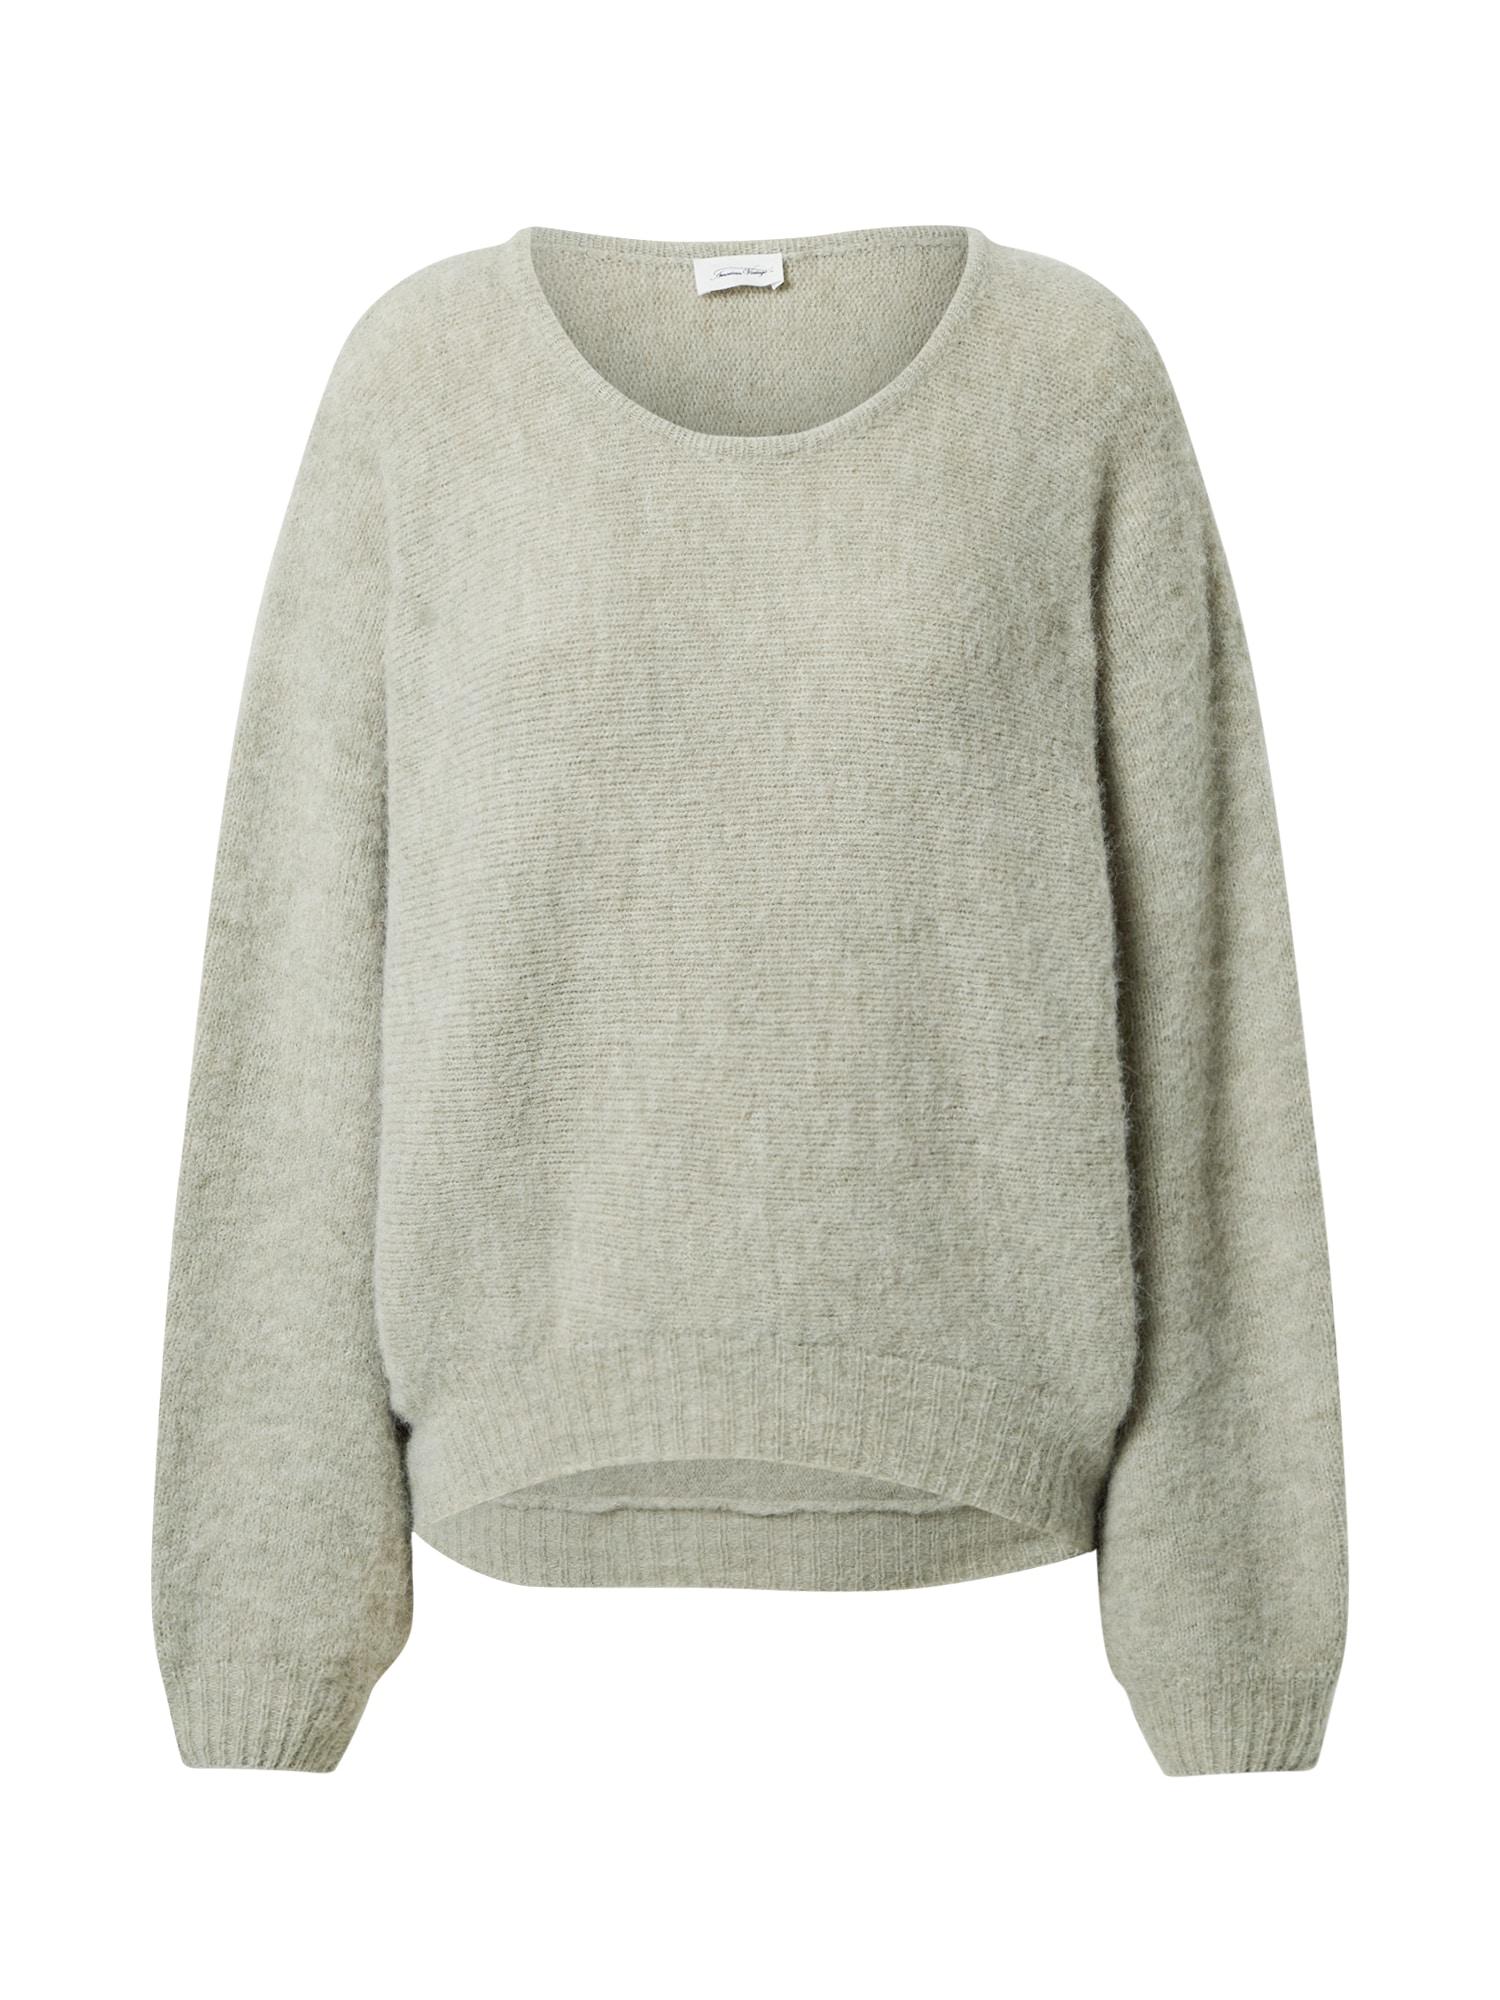 AMERICAN VINTAGE Megztinis pilka